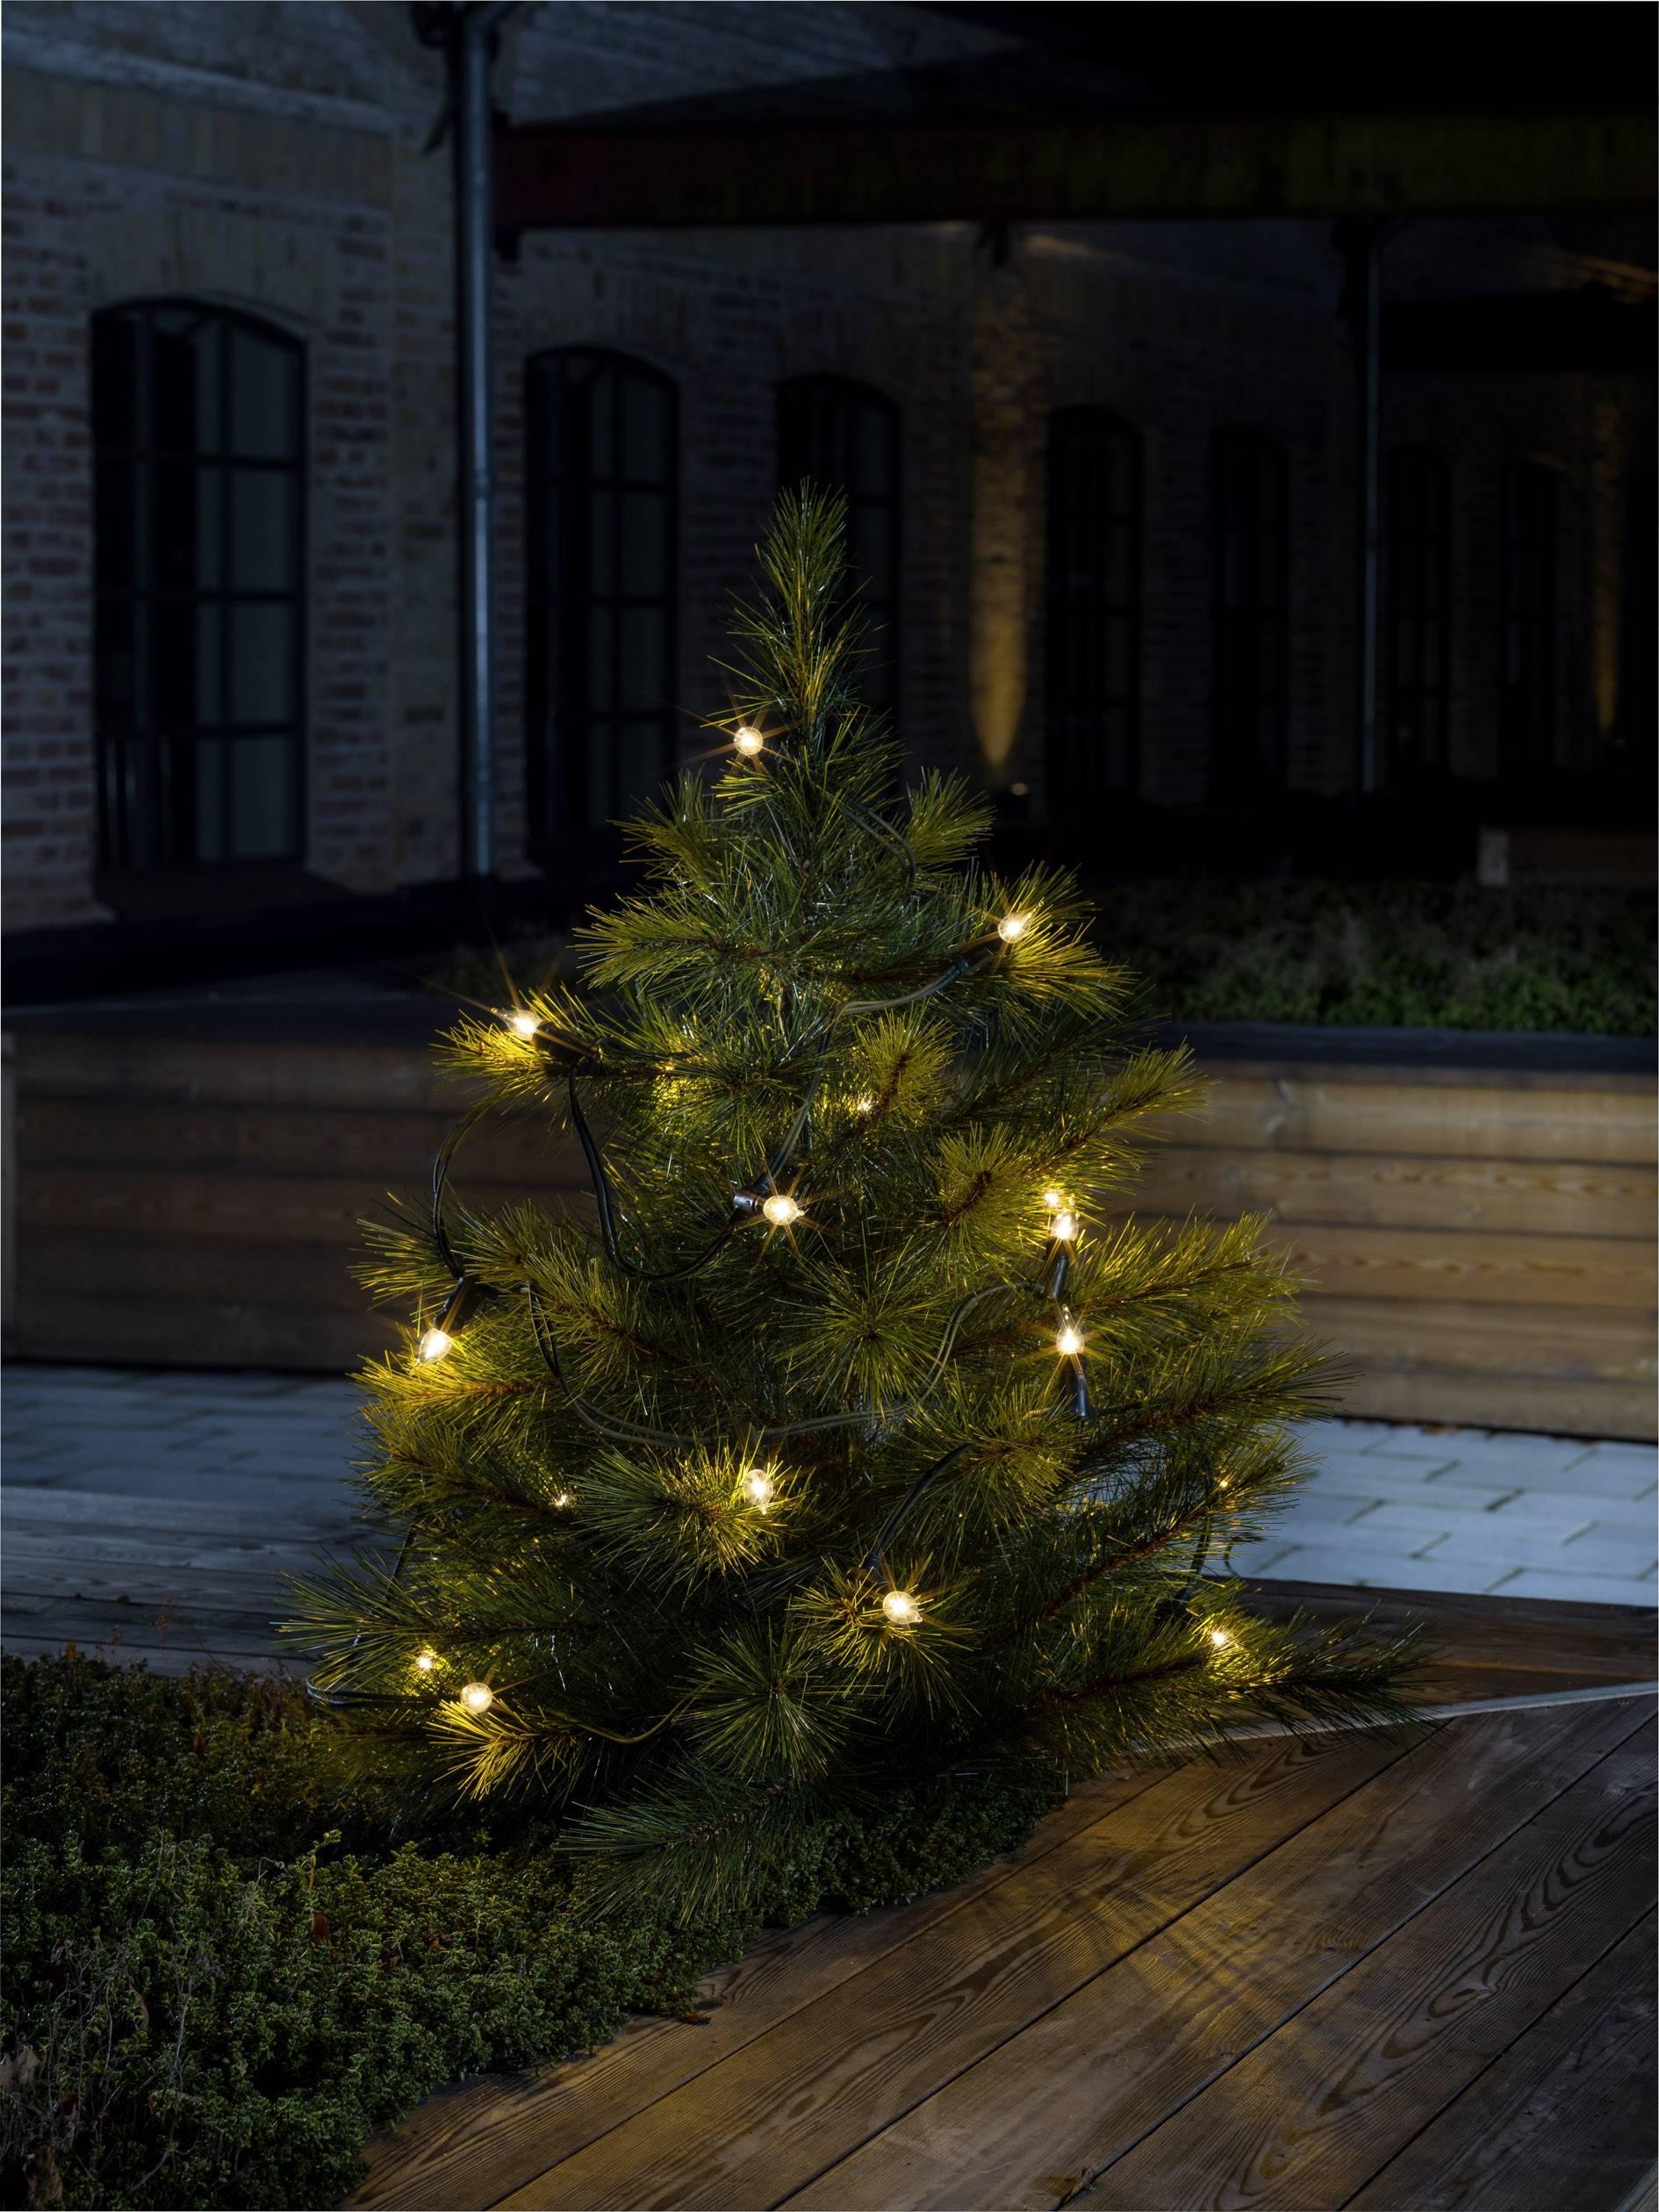 eclairage arbre stunning images gratuites paris france. Black Bedroom Furniture Sets. Home Design Ideas